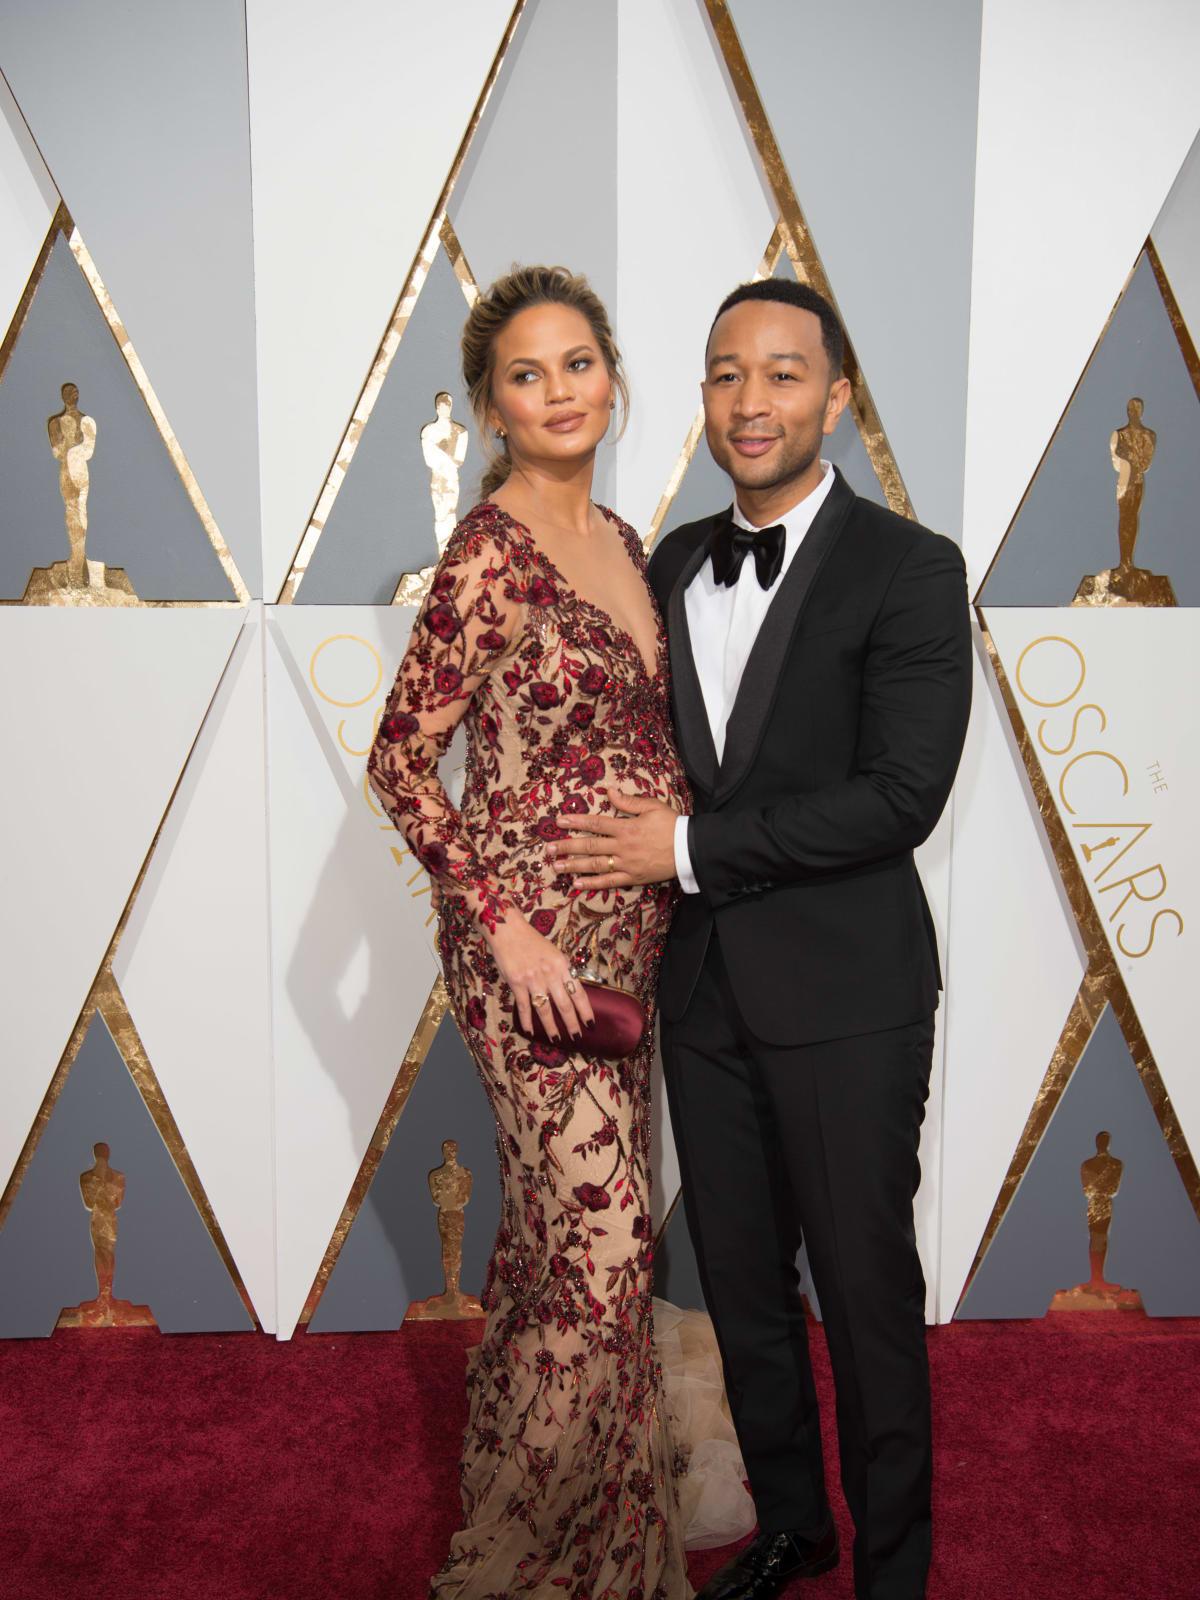 Chrissie Teagen and John Legend at Oscars